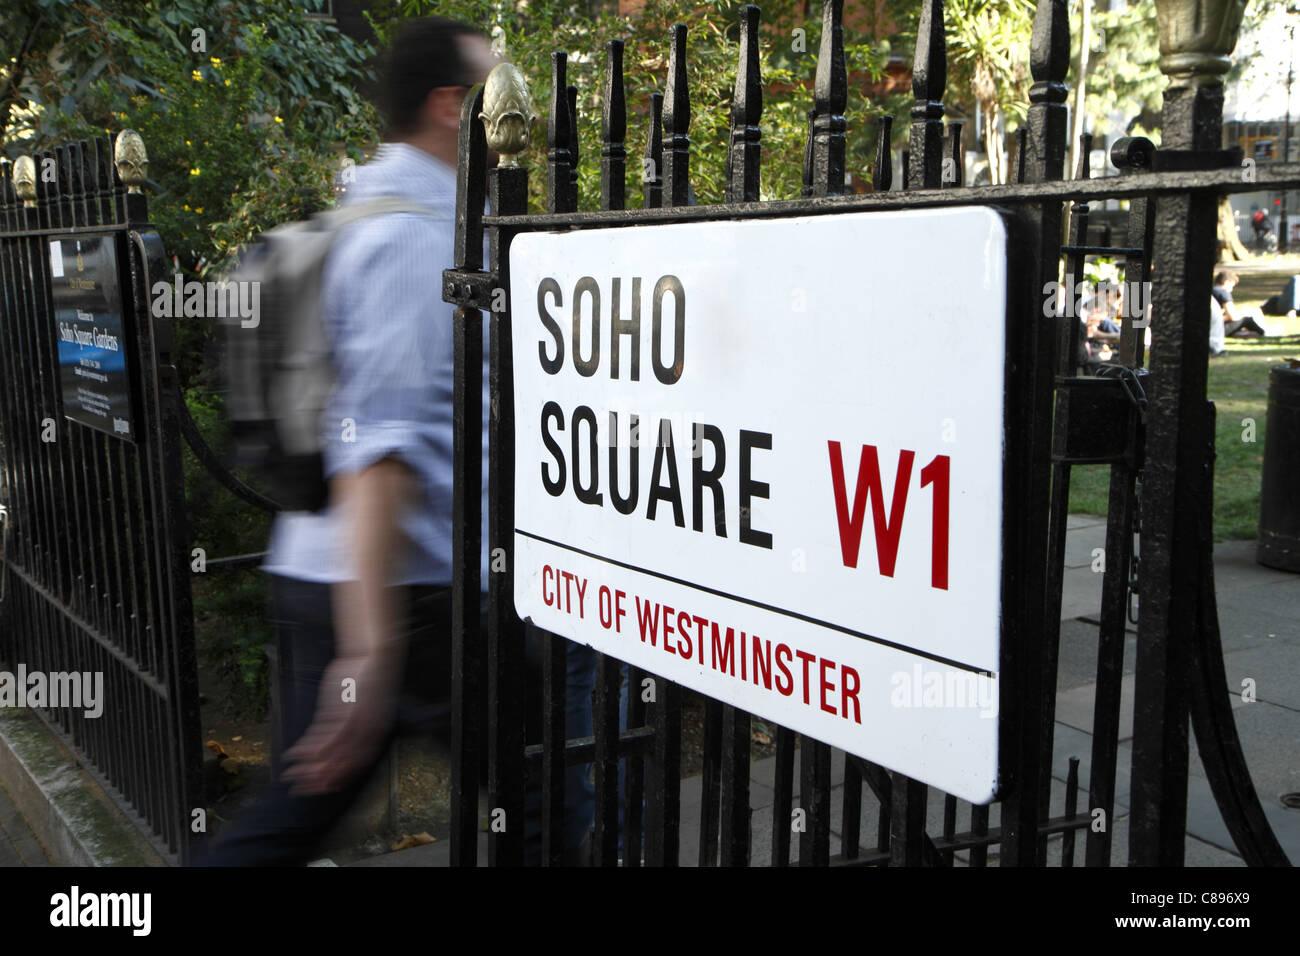 Soho Square, street sign, London, UK - Stock Image